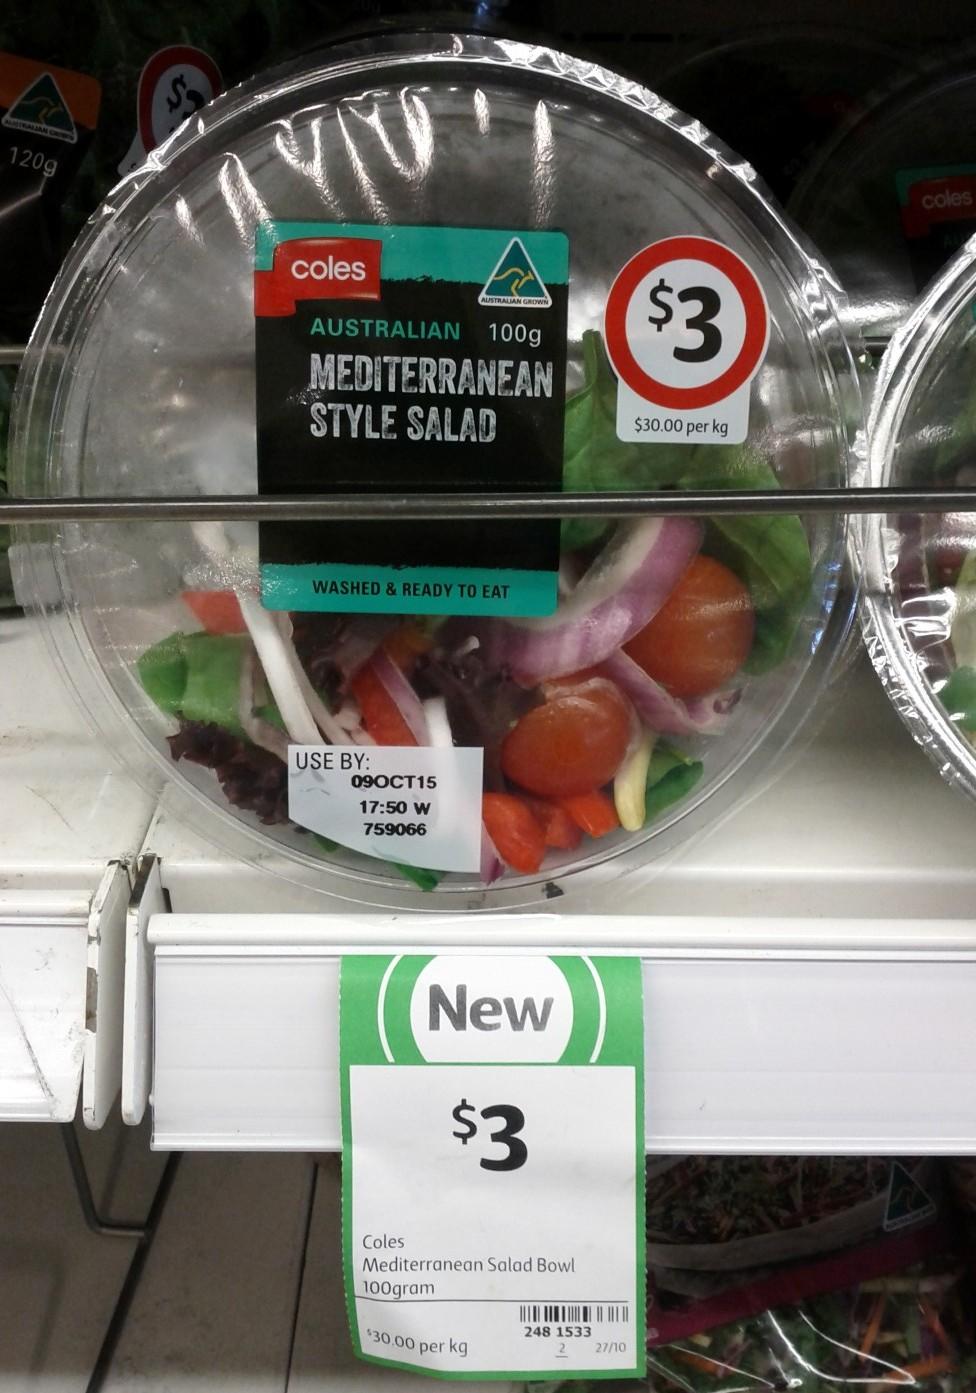 Coles Salad Bowl 100g Medierranean Style Salad